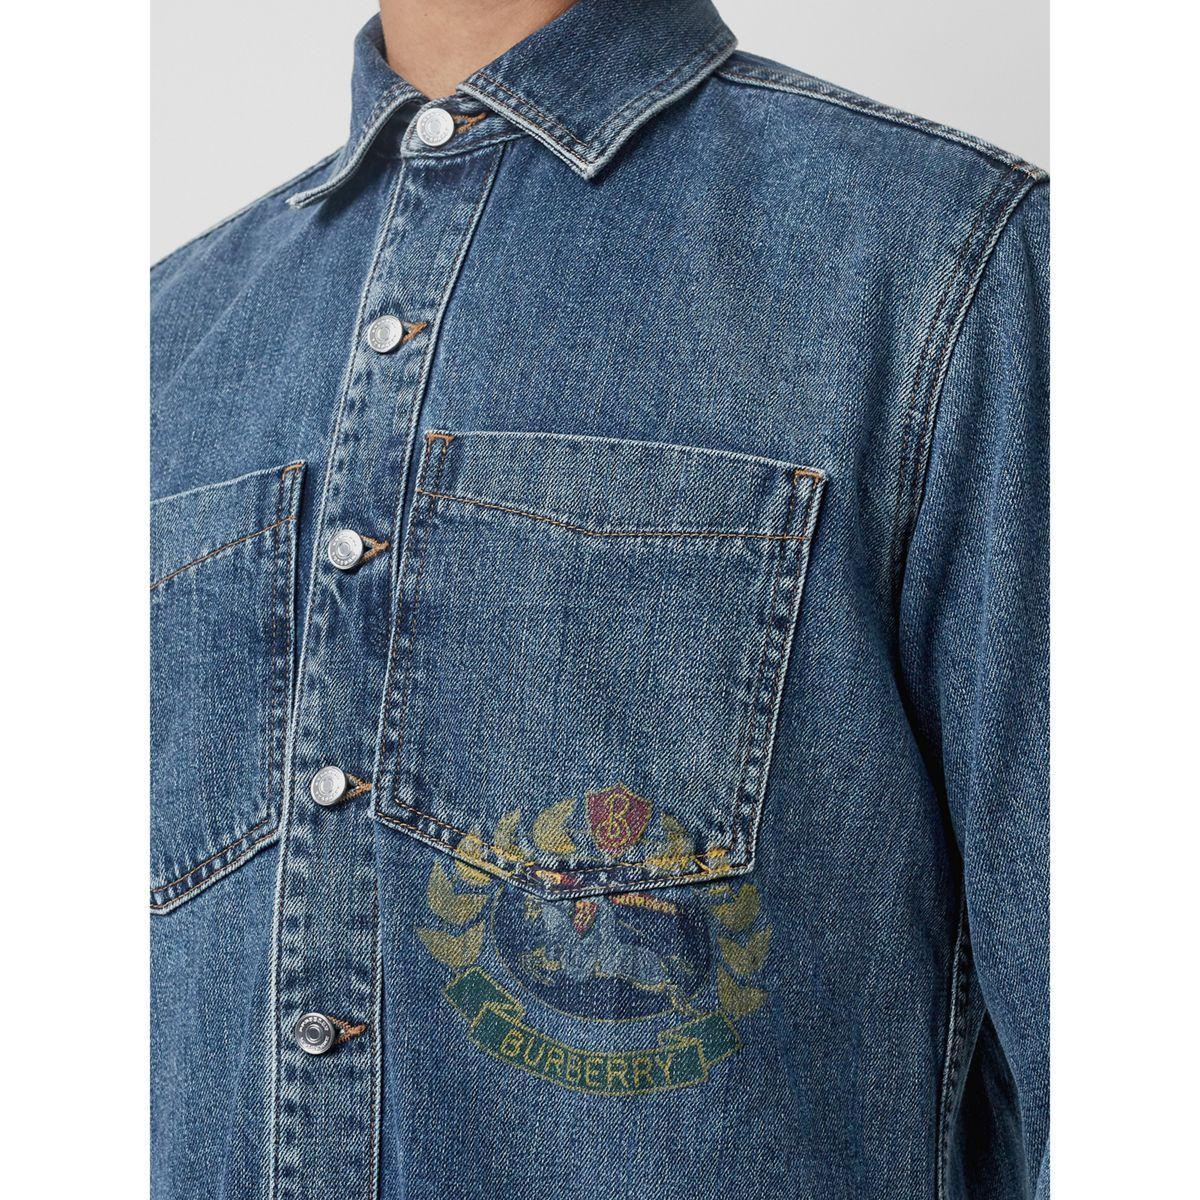 94e511b3c3d ... Crest Print Denim Overshirt for Men - Lyst. View fullscreen